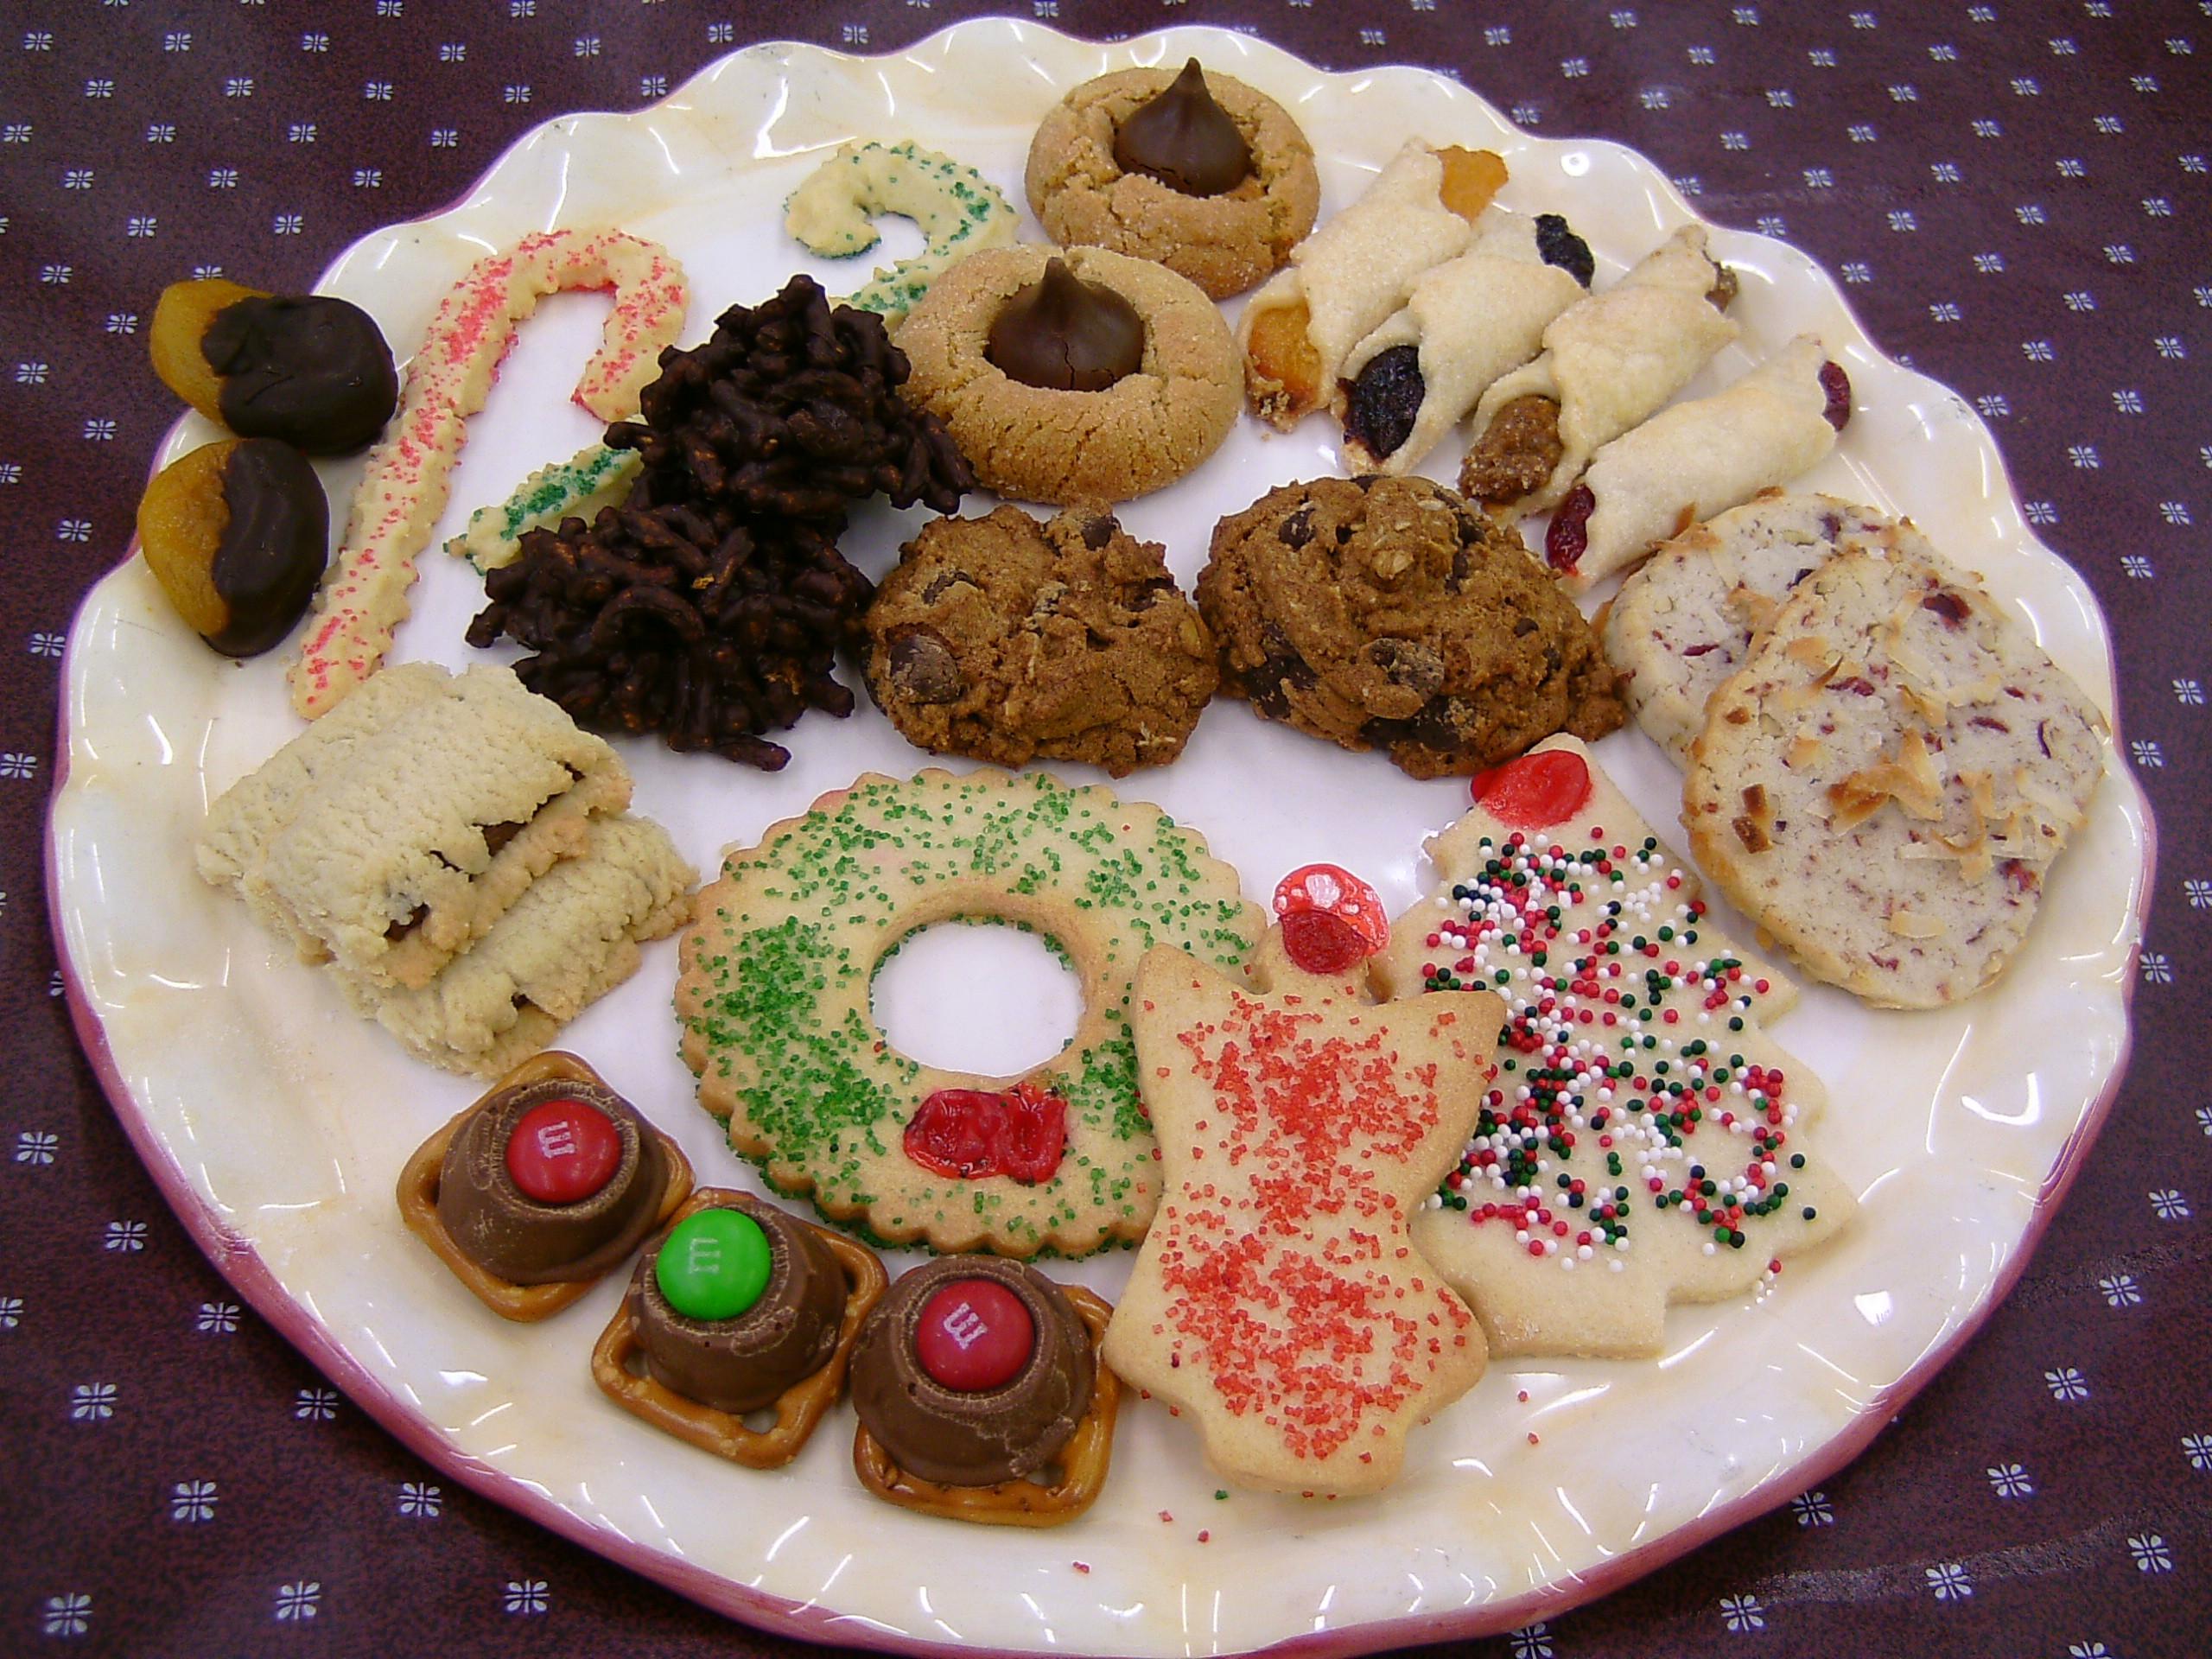 Bakery Christmas Cookies  Christmas Cookie and Bakery Sale – December 16 2012